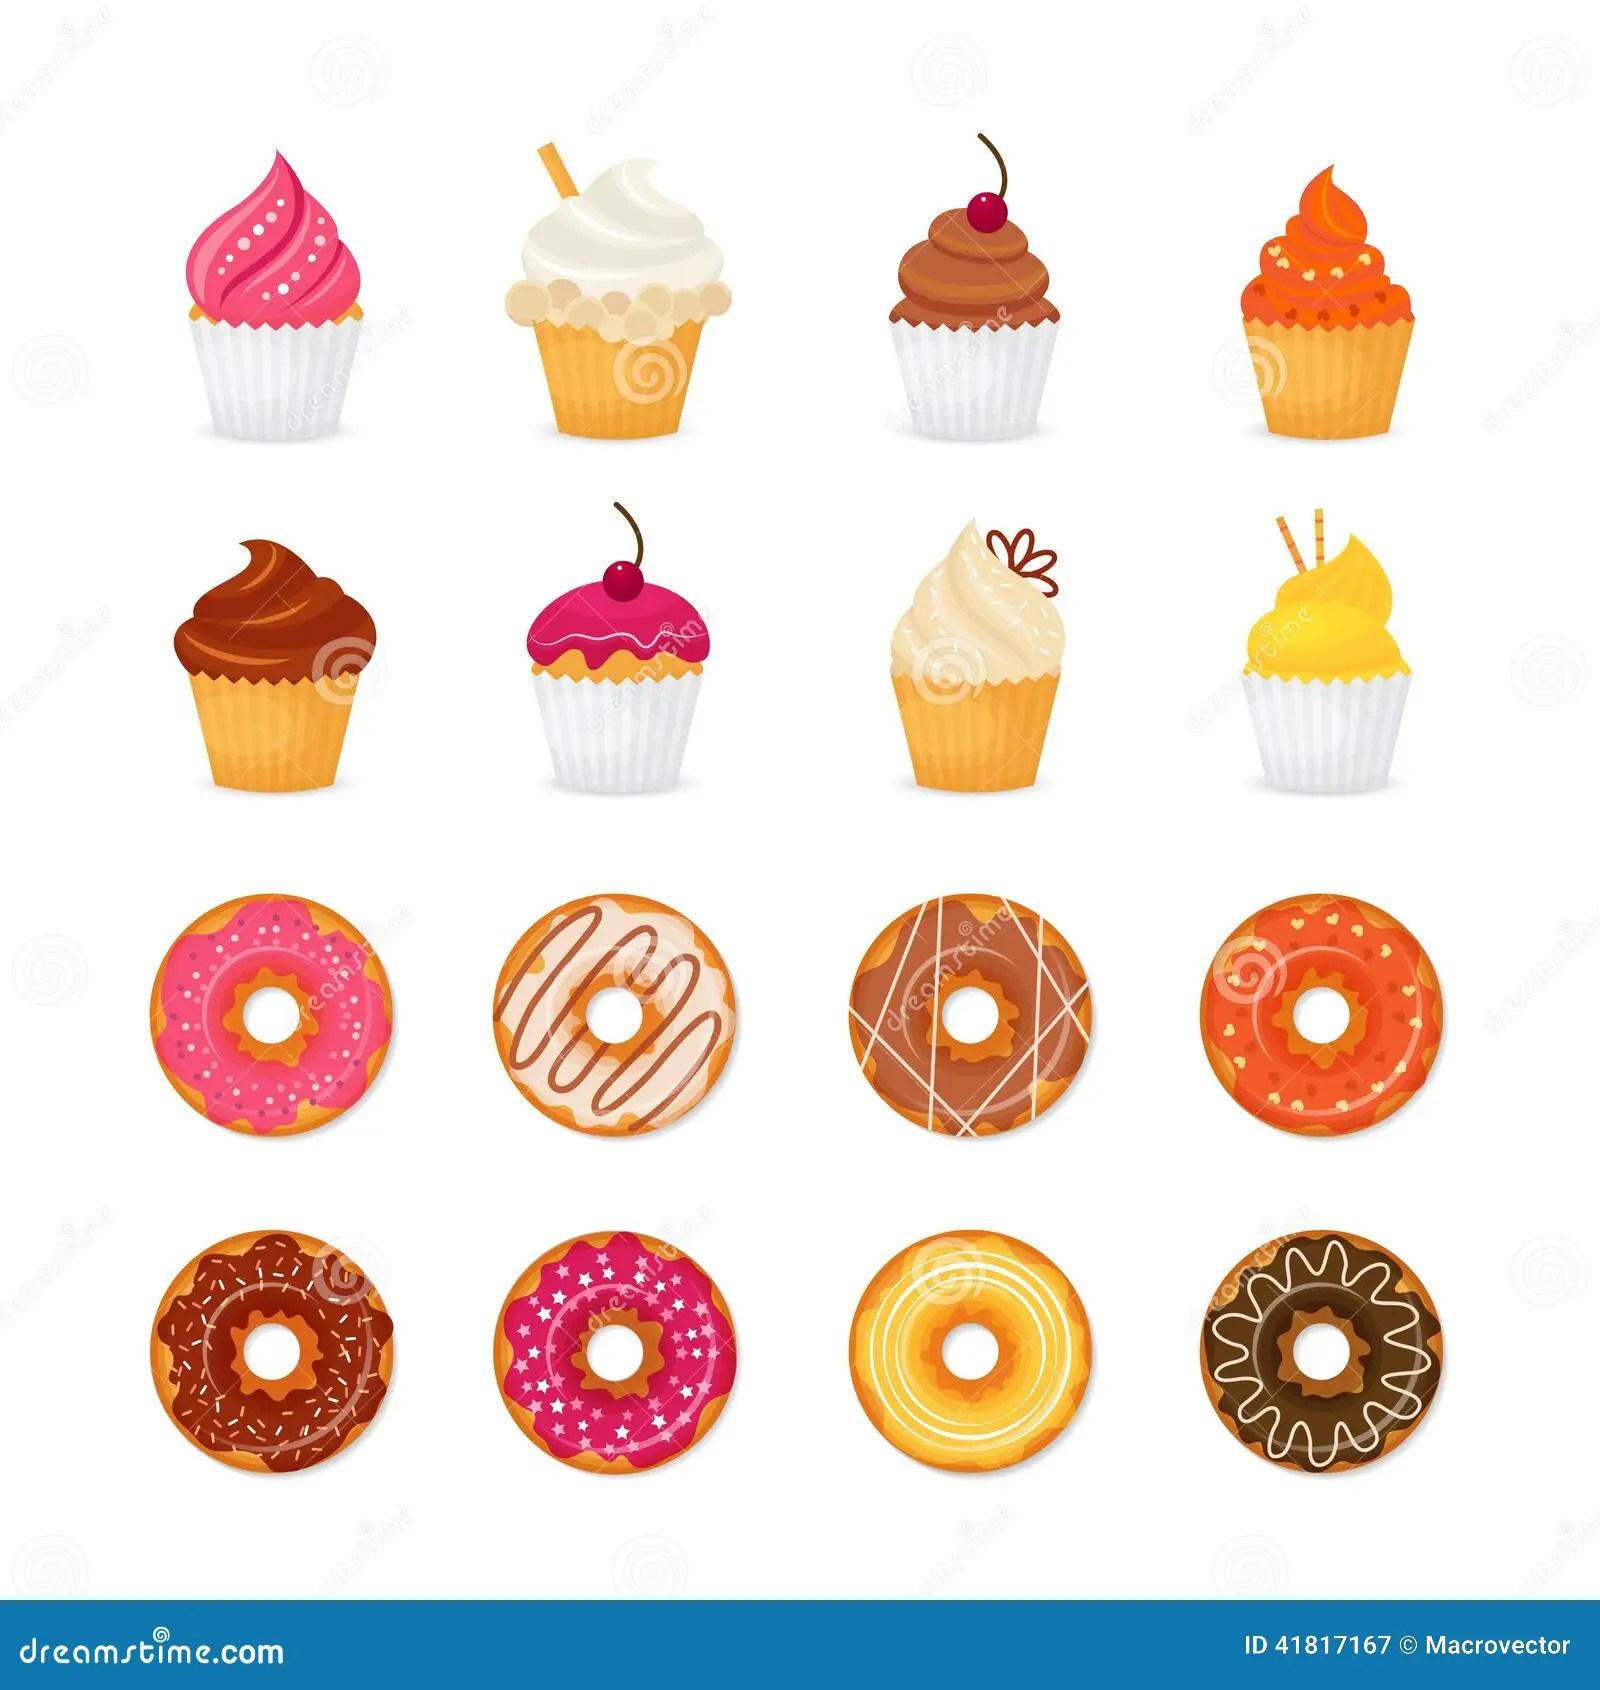 Cute Bakery Wallpaper Donut Cupcake Icon Stock Vector Illustration Of Doughnut